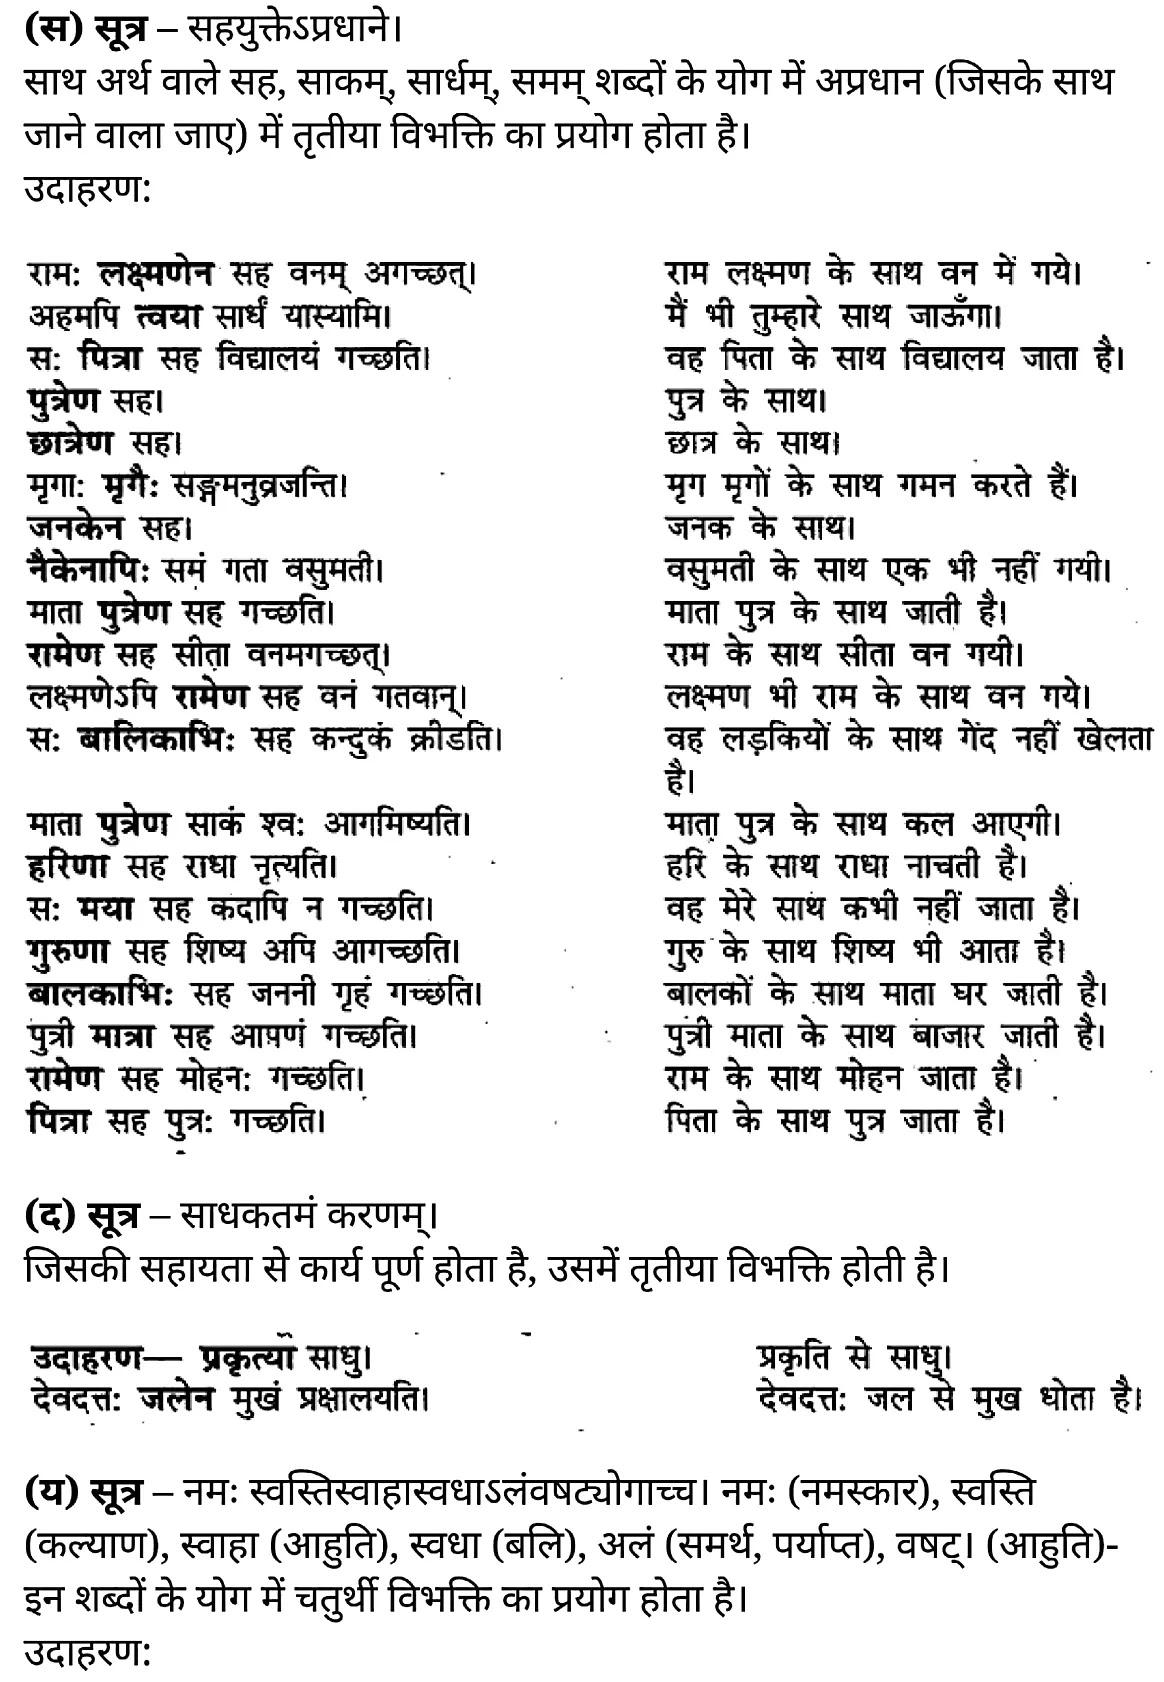 कक्षा 11 साहित्यिक हिंदीविभक्ति-प्रकरण  के नोट्स साहित्यिक हिंदी में एनसीईआरटी समाधान,   class 11 sahityik hindi vibhakti-prakaran,  class 11 sahityik hindi vibhakti-prakaran ncert solutions in sahityik hindi,  class 11 sahityik hindi vibhakti-prakaran notes in sahityik hindi,  class 11 sahityik hindi vibhakti-prakaran question answer,  class 11 sahityik hindi vibhakti-prakaran notes,  11   class vibhakti-prakaran in sahityik hindi,  class 11 sahityik hindi vibhakti-prakaran in sahityik hindi,  class 11 sahityik hindi vibhakti-prakaran important questions in sahityik hindi,  class 11 sahityik hindi  vibhakti-prakaran notes in sahityik hindi,  class 11 sahityik hindi vibhakti-prakaran test,  class 11 sahityik hindi vibhakti-prakaran pdf,  class 11 sahityik hindi vibhakti-prakaran notes pdf,  class 11 sahityik hindi vibhakti-prakaran exercise solutions,  class 11 sahityik hindi vibhakti-prakaran, class 11 sahityik hindi vibhakti-prakaran notes study rankers,  class 11 sahityik hindi vibhakti-prakaran notes,  class 11 sahityik hindi  vibhakti-prakaran notes,   vibhakti-prakaran 11  notes pdf, vibhakti-prakaran class 11  notes  ncert,  vibhakti-prakaran class 11 pdf,   vibhakti-prakaran  book,    vibhakti-prakaran quiz class 11  ,       11  th vibhakti-prakaran    book up board,       up board 11  th vibhakti-prakaran notes,  कक्षा 11 साहित्यिक हिंदीविभक्ति-प्रकरण , कक्षा 11 साहित्यिक हिंदी का विभक्ति-प्रकरण , कक्षा 11 साहित्यिक हिंदी के विभक्ति-प्रकरण  के नोट्स हिंदी में, कक्षा 11 का साहित्यिक हिंदीविभक्ति-प्रकरण का प्रश्न उत्तर, कक्षा 11 साहित्यिक हिंदीविभक्ति-प्रकरण के नोट्स, 11 कक्षा साहित्यिक हिंदीविभक्ति-प्रकरण   साहित्यिक हिंदी में, कक्षा 11 साहित्यिक हिंदीविभक्ति-प्रकरण हिंदी में, कक्षा 11 साहित्यिक हिंदीविभक्ति-प्रकरण  महत्वपूर्ण प्रश्न हिंदी में, कक्षा 11 के साहित्यिक हिंदी के नोट्स हिंदी में,साहित्यिक हिंदी कक्षा 11 नोट्स pdf,  साहित्यिक हिंदी  कक्षा 11 नोट्स 2021 ncert,  साहित्यिक हिंदी  कक्षा 11 pdf,  साहित्यिक हिंदी  पुस्तक,  साहित्यिक हिंदी की बुक,  साहित